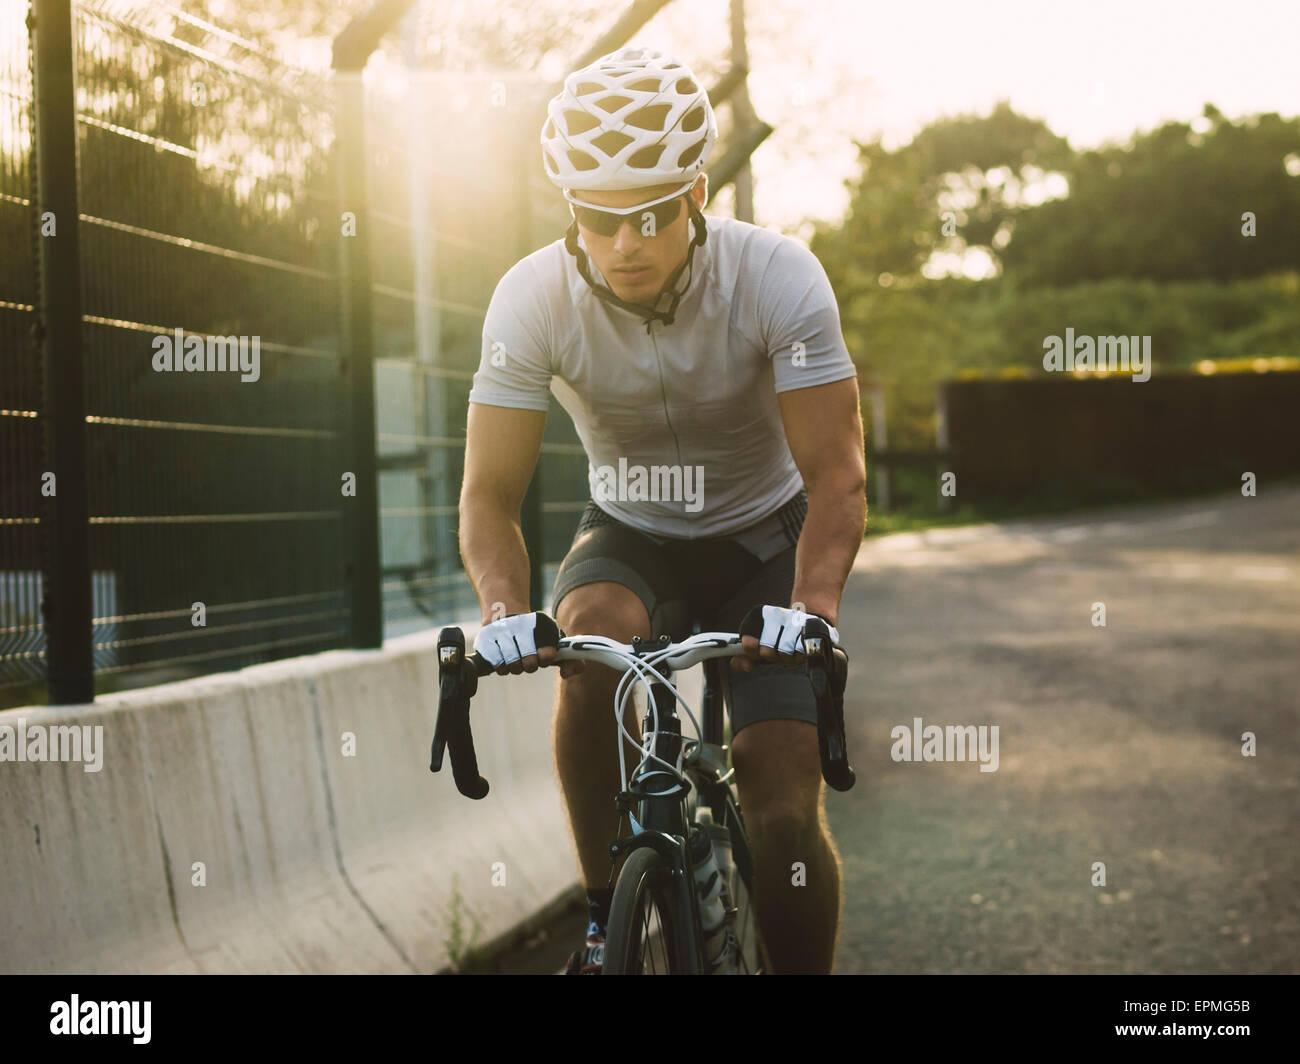 Racing biker at backlight - Stock Image